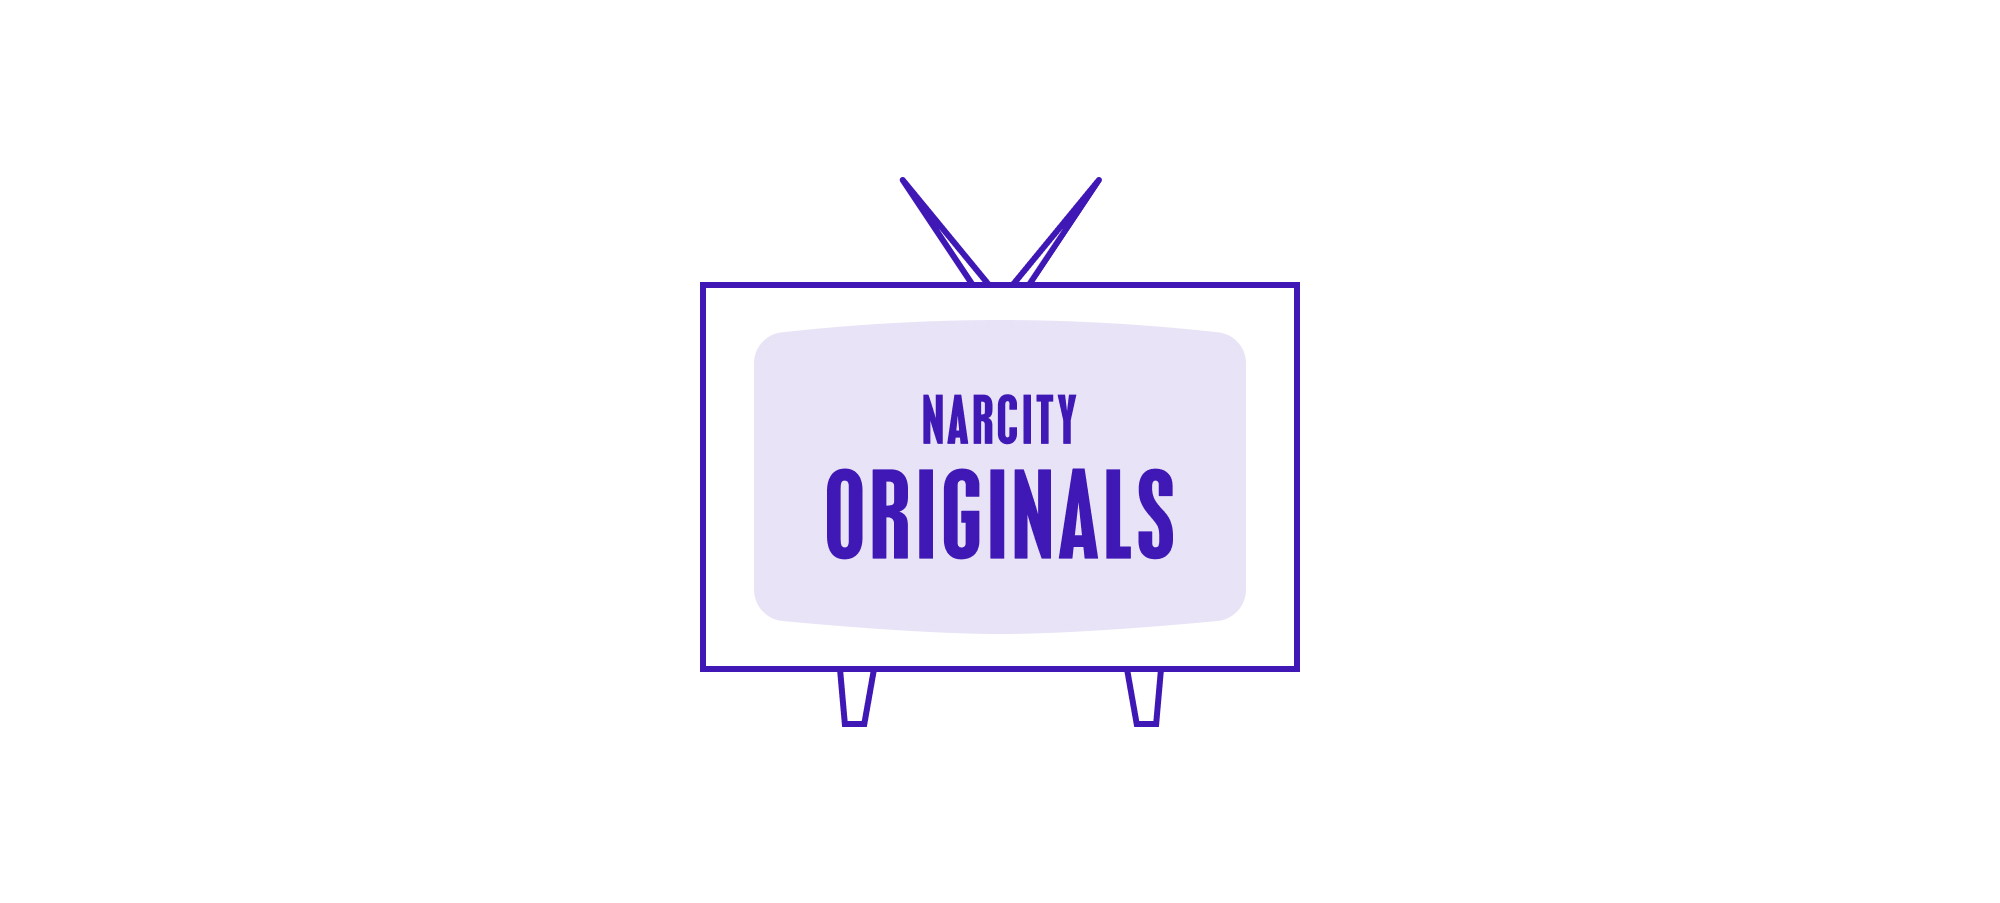 Narcity Originals Video Hub